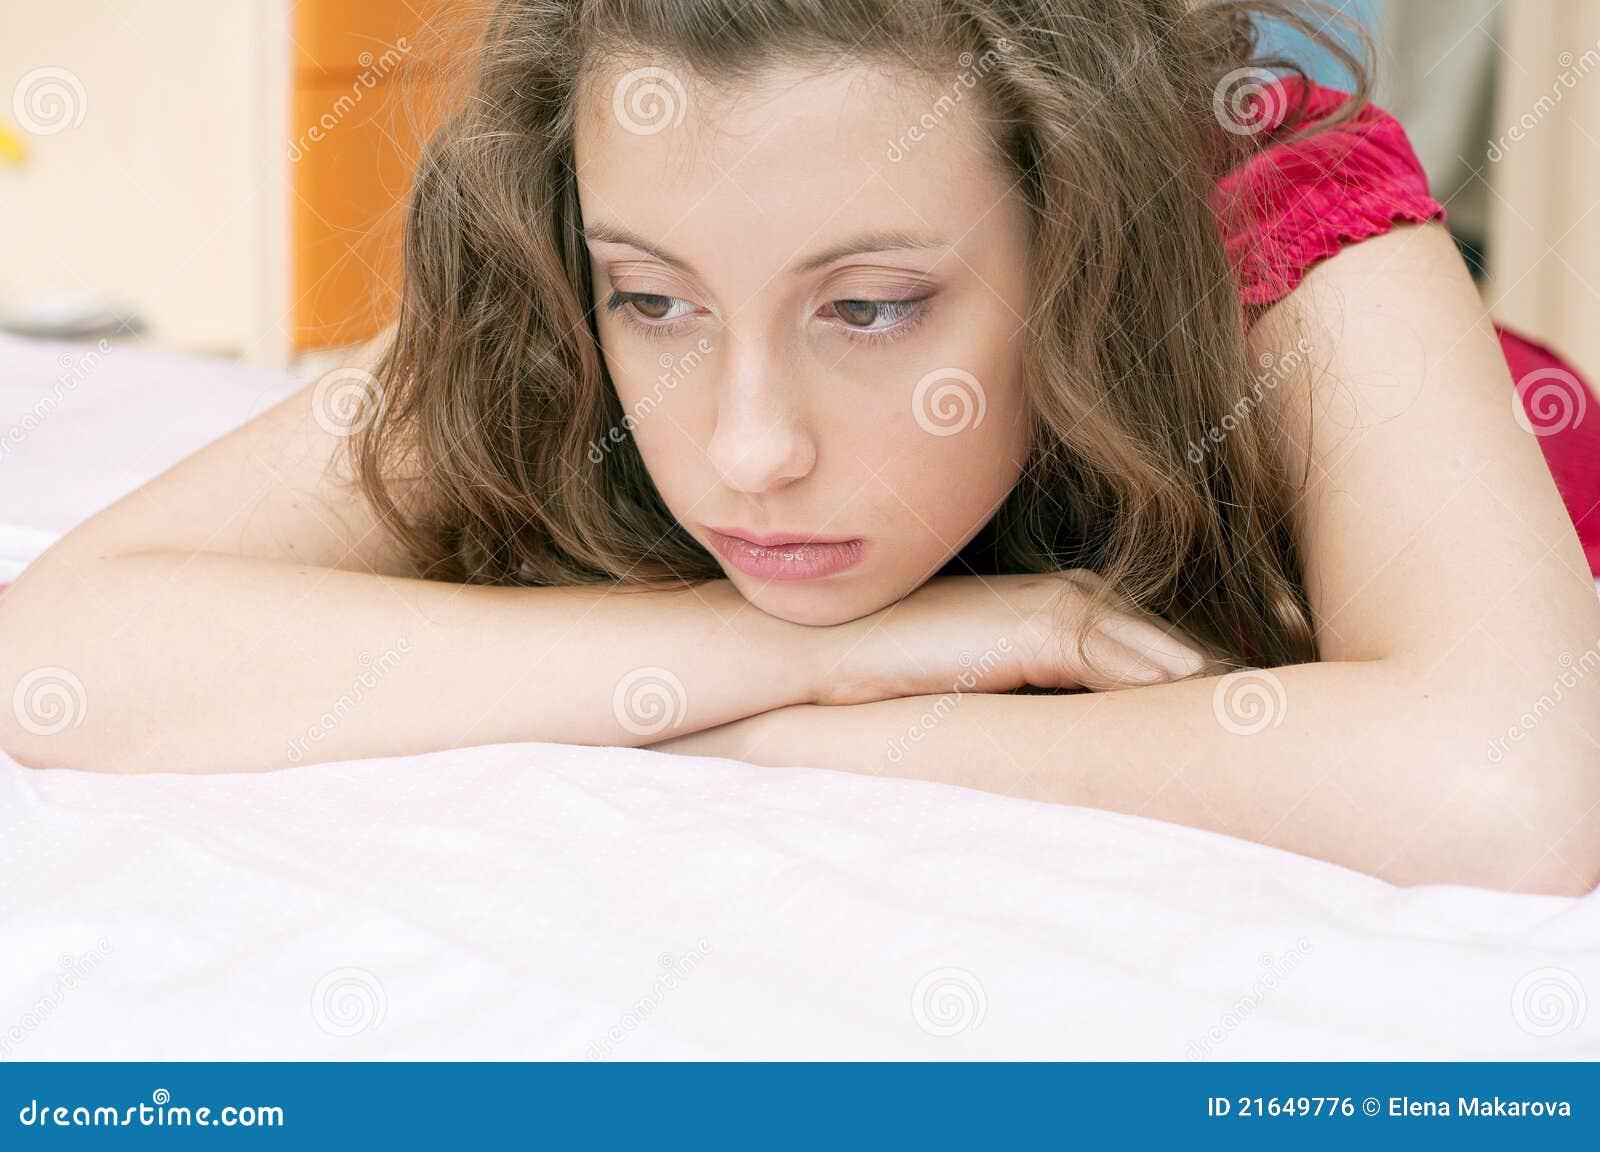 Distressed girl 2